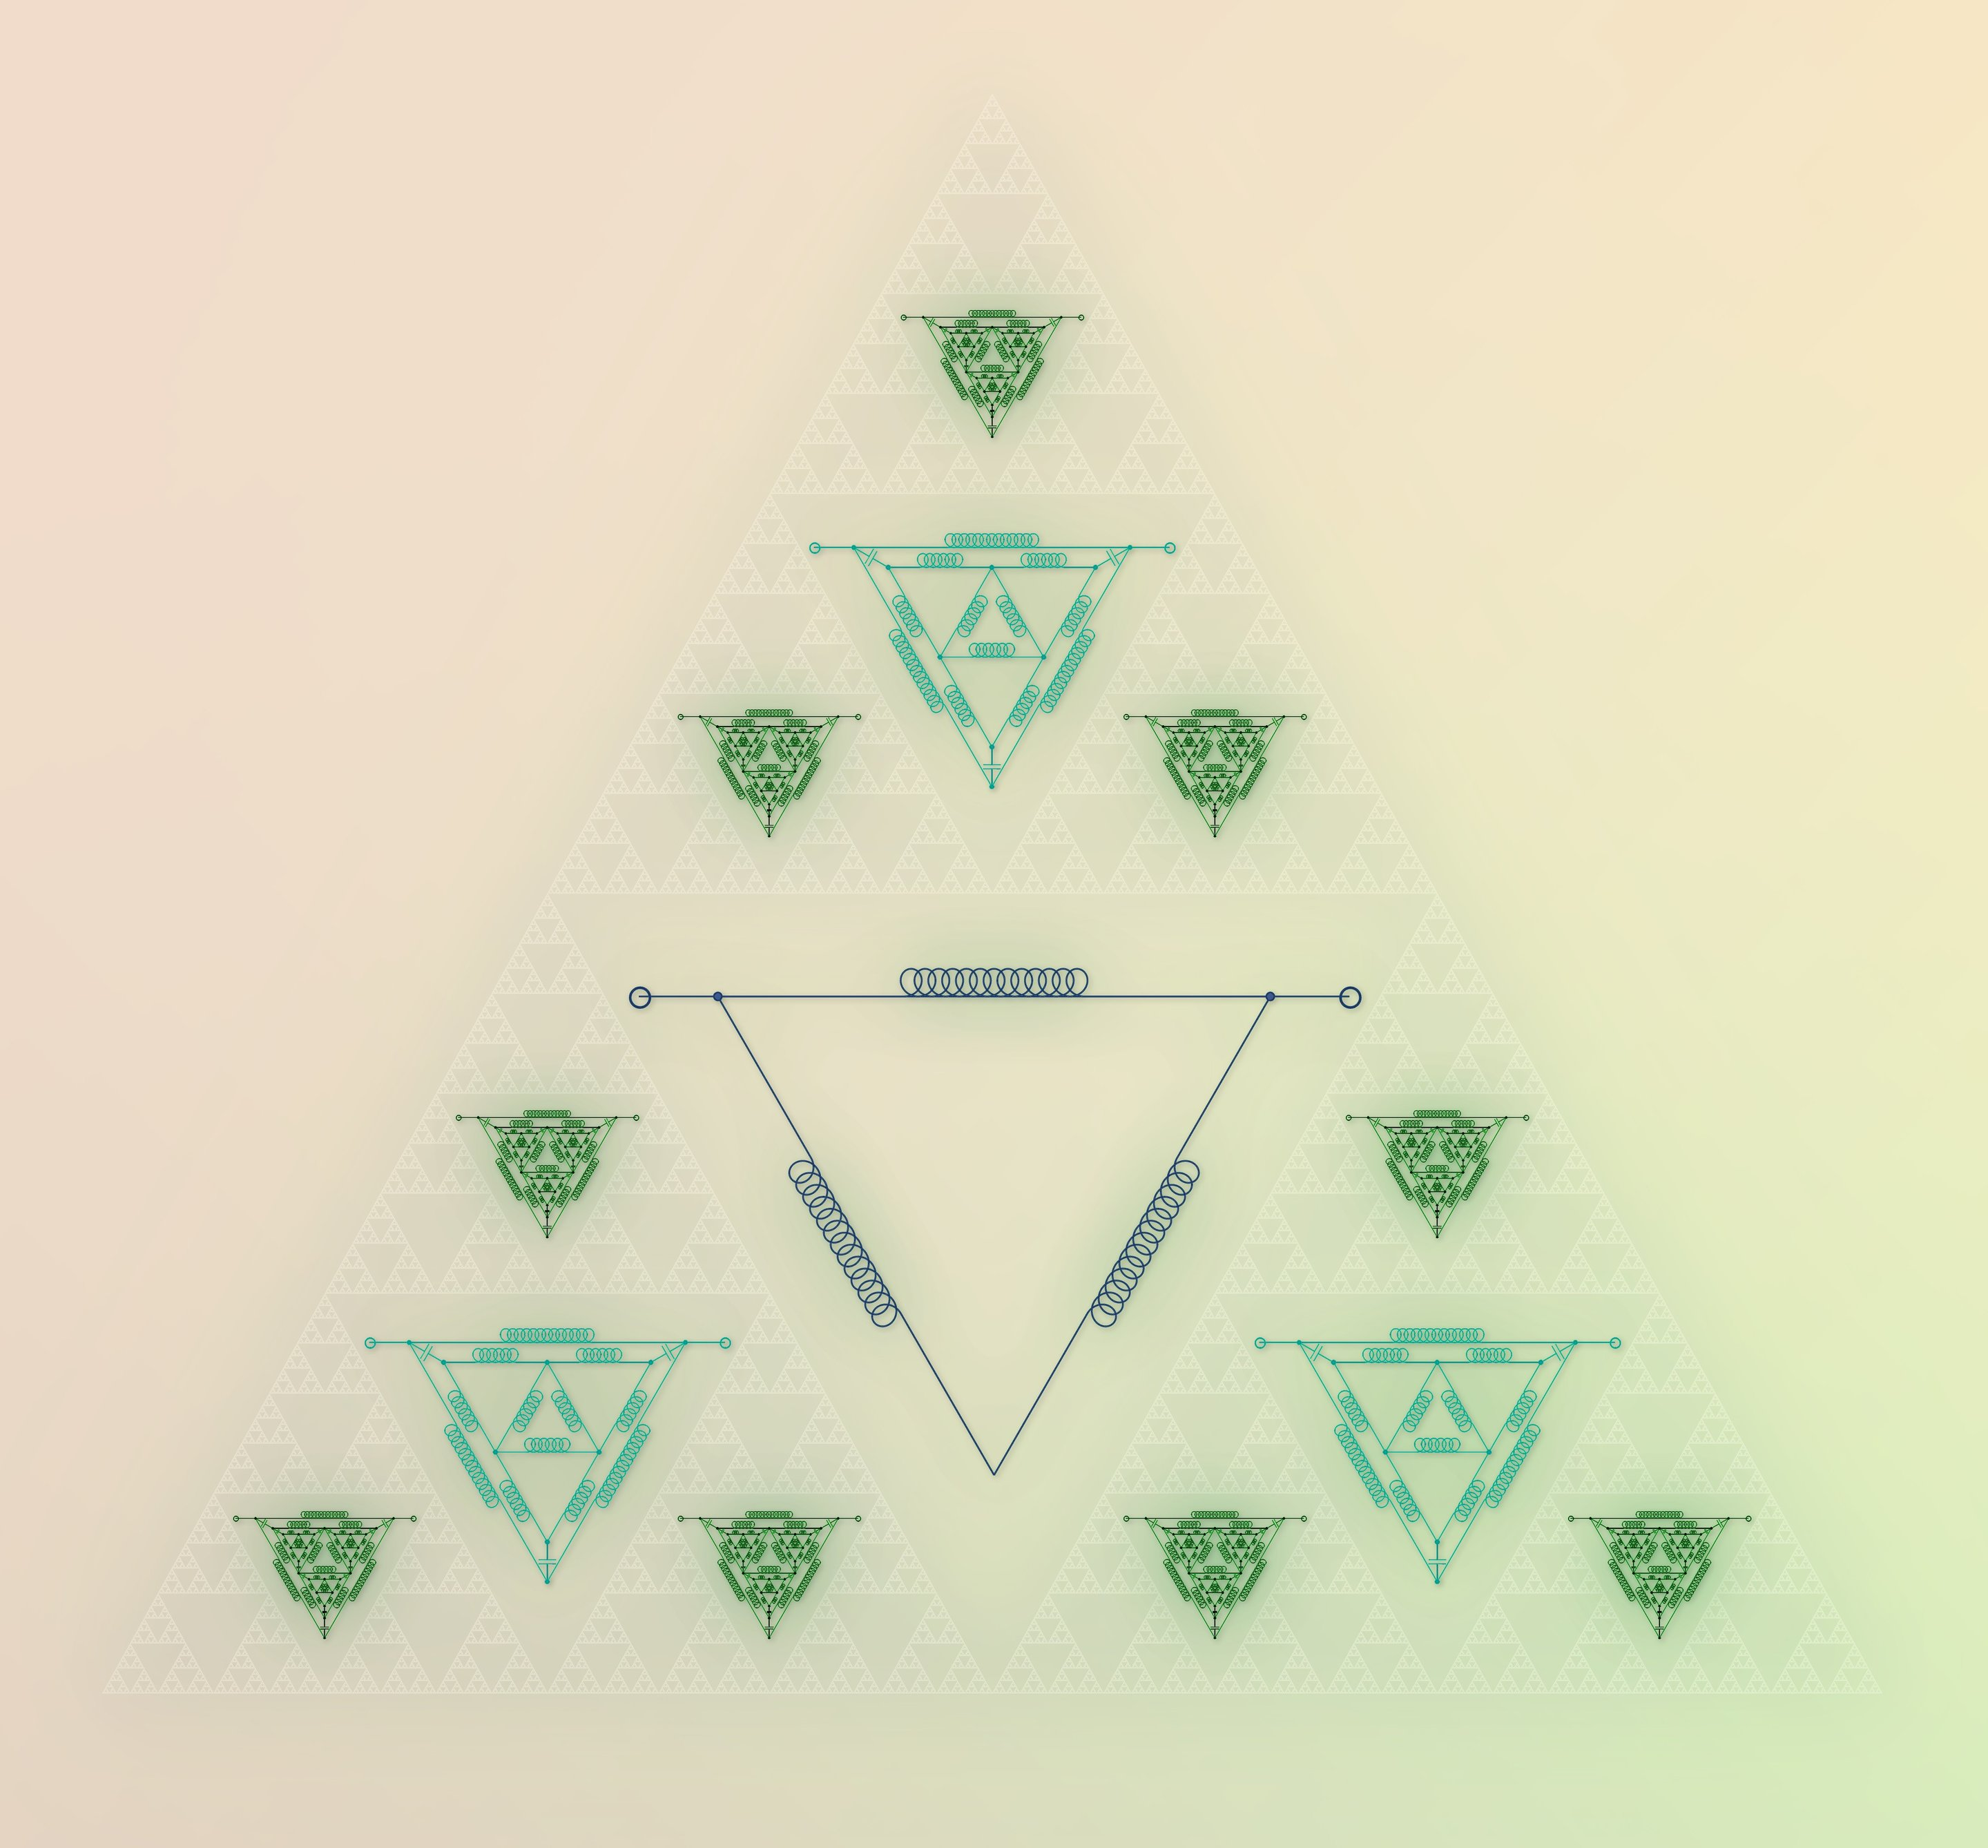 The splendid generative potential of the Sierpinski triangle